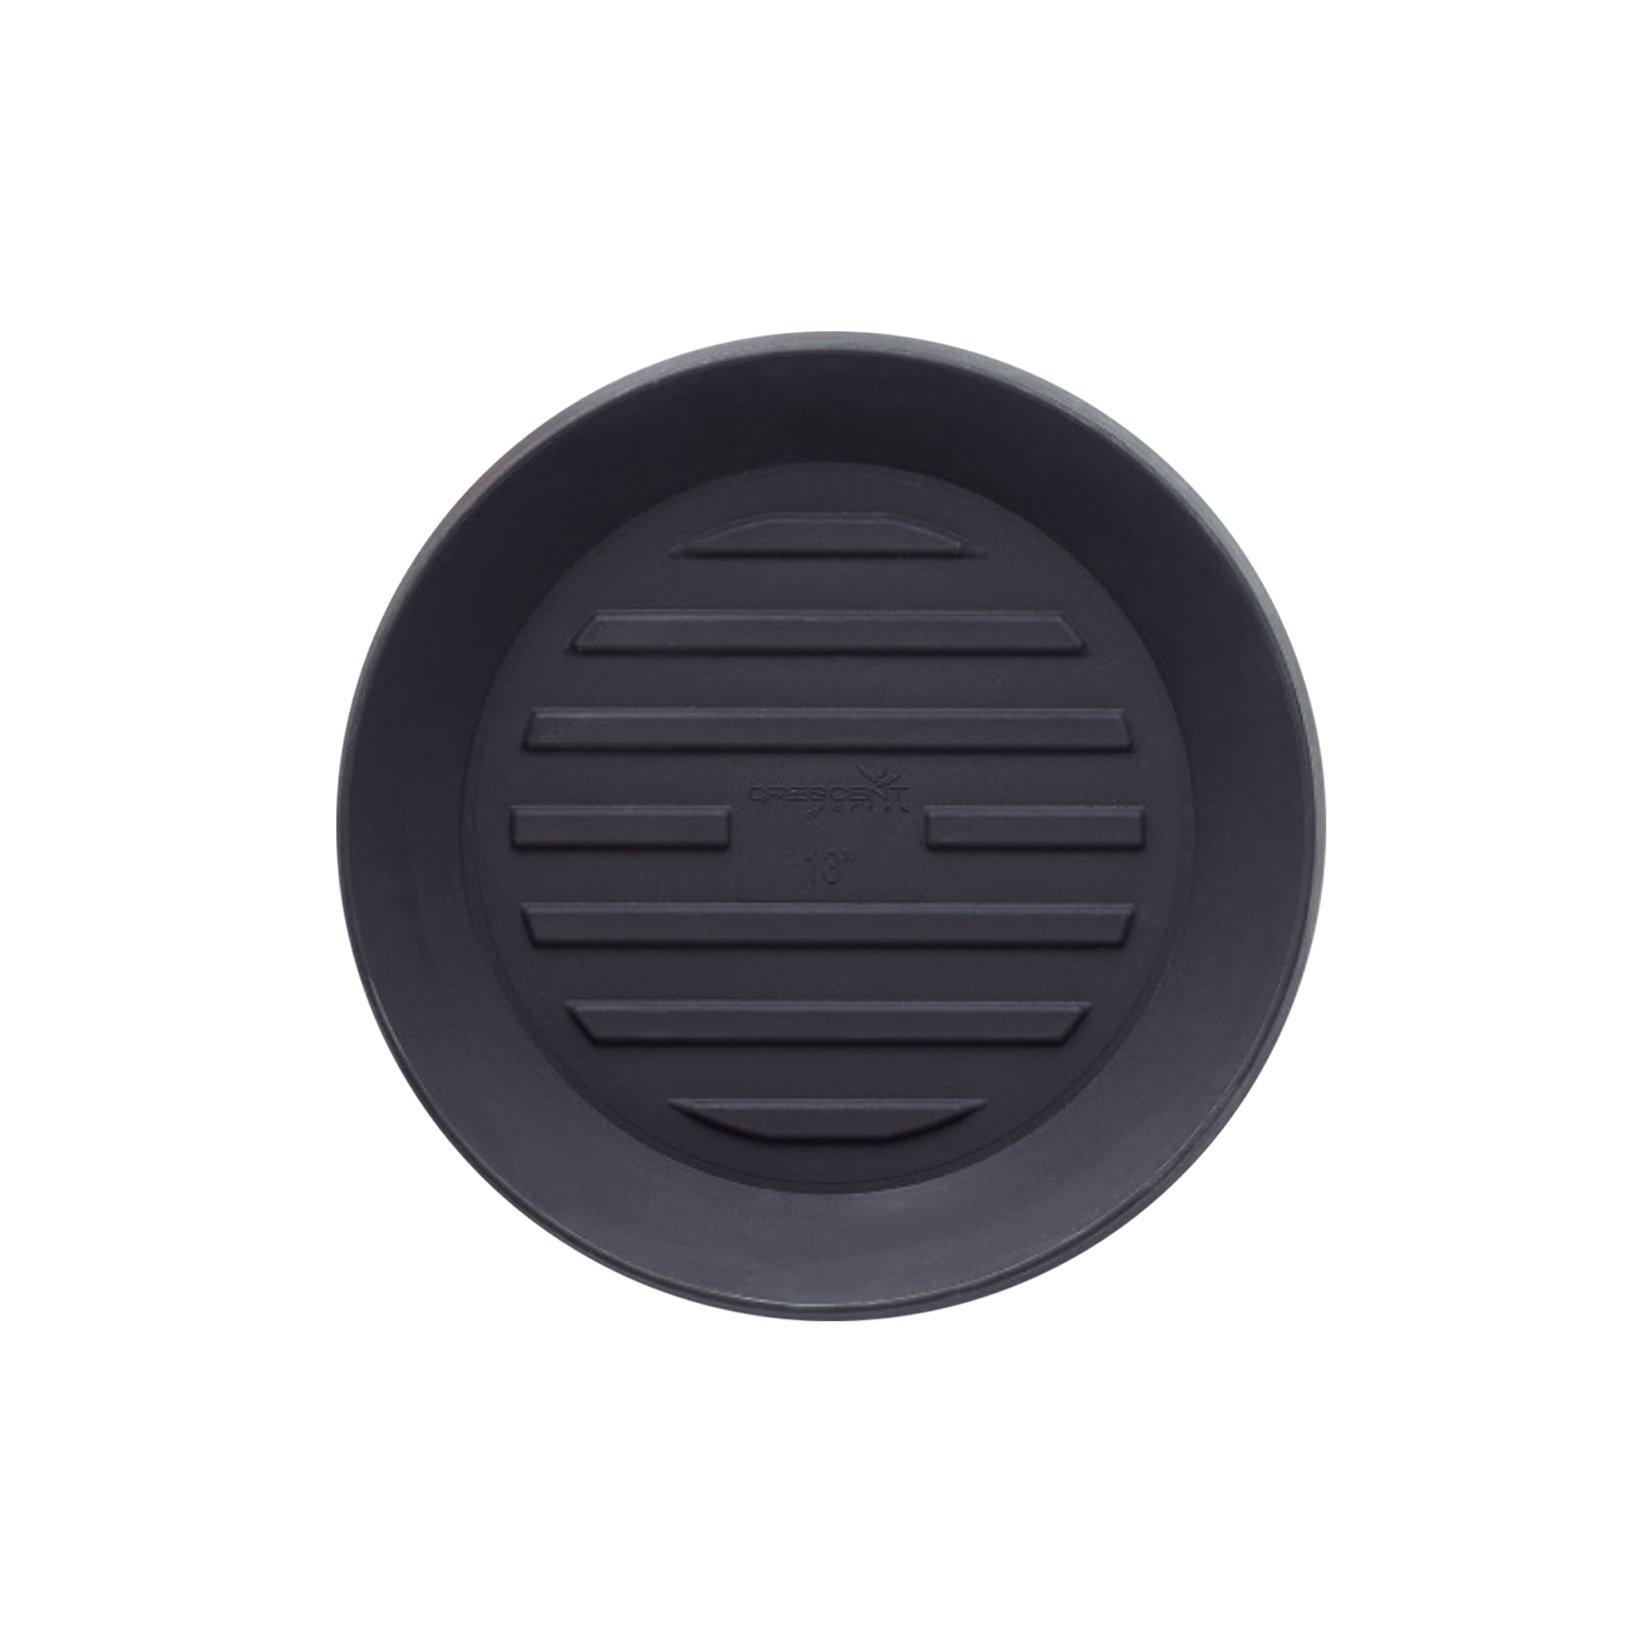 Crescent Garden A990894T Round 8'' Universal Saucer, 8'', Caviar Black